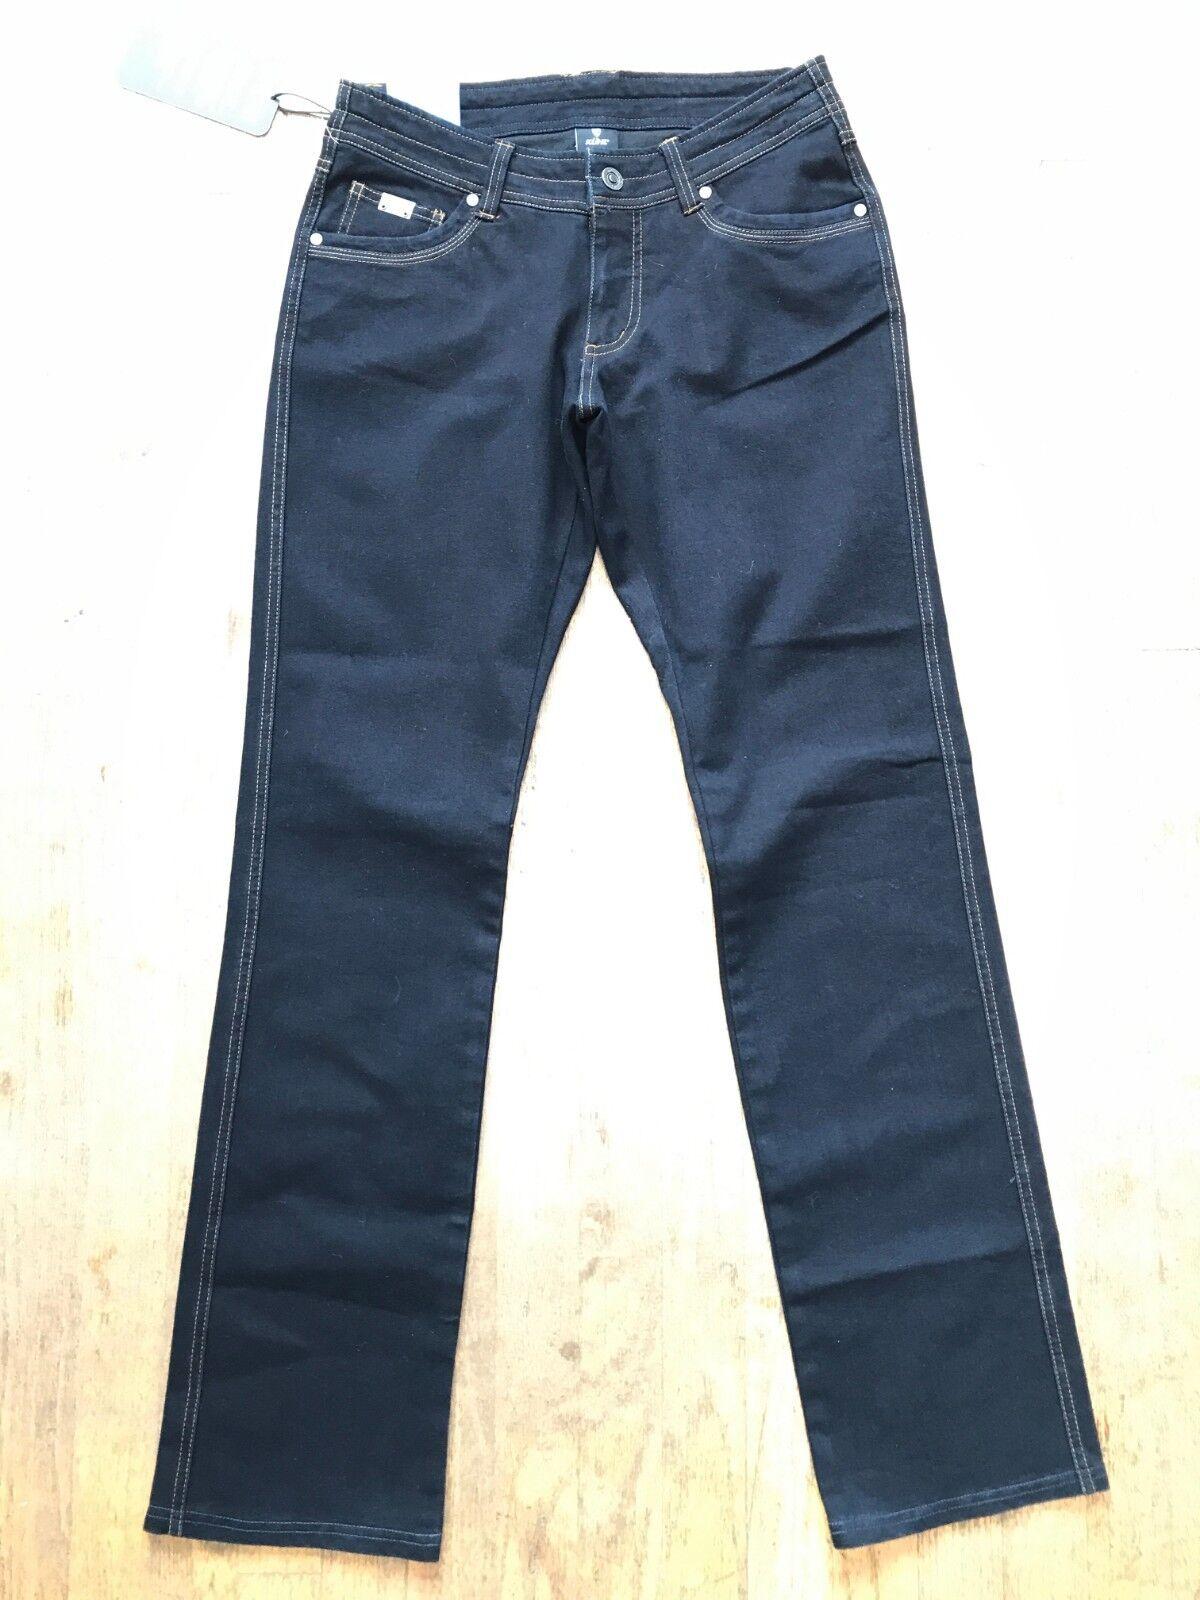 Women's Kuhl Danzr Straight Jeans Size 6 Dark bluee